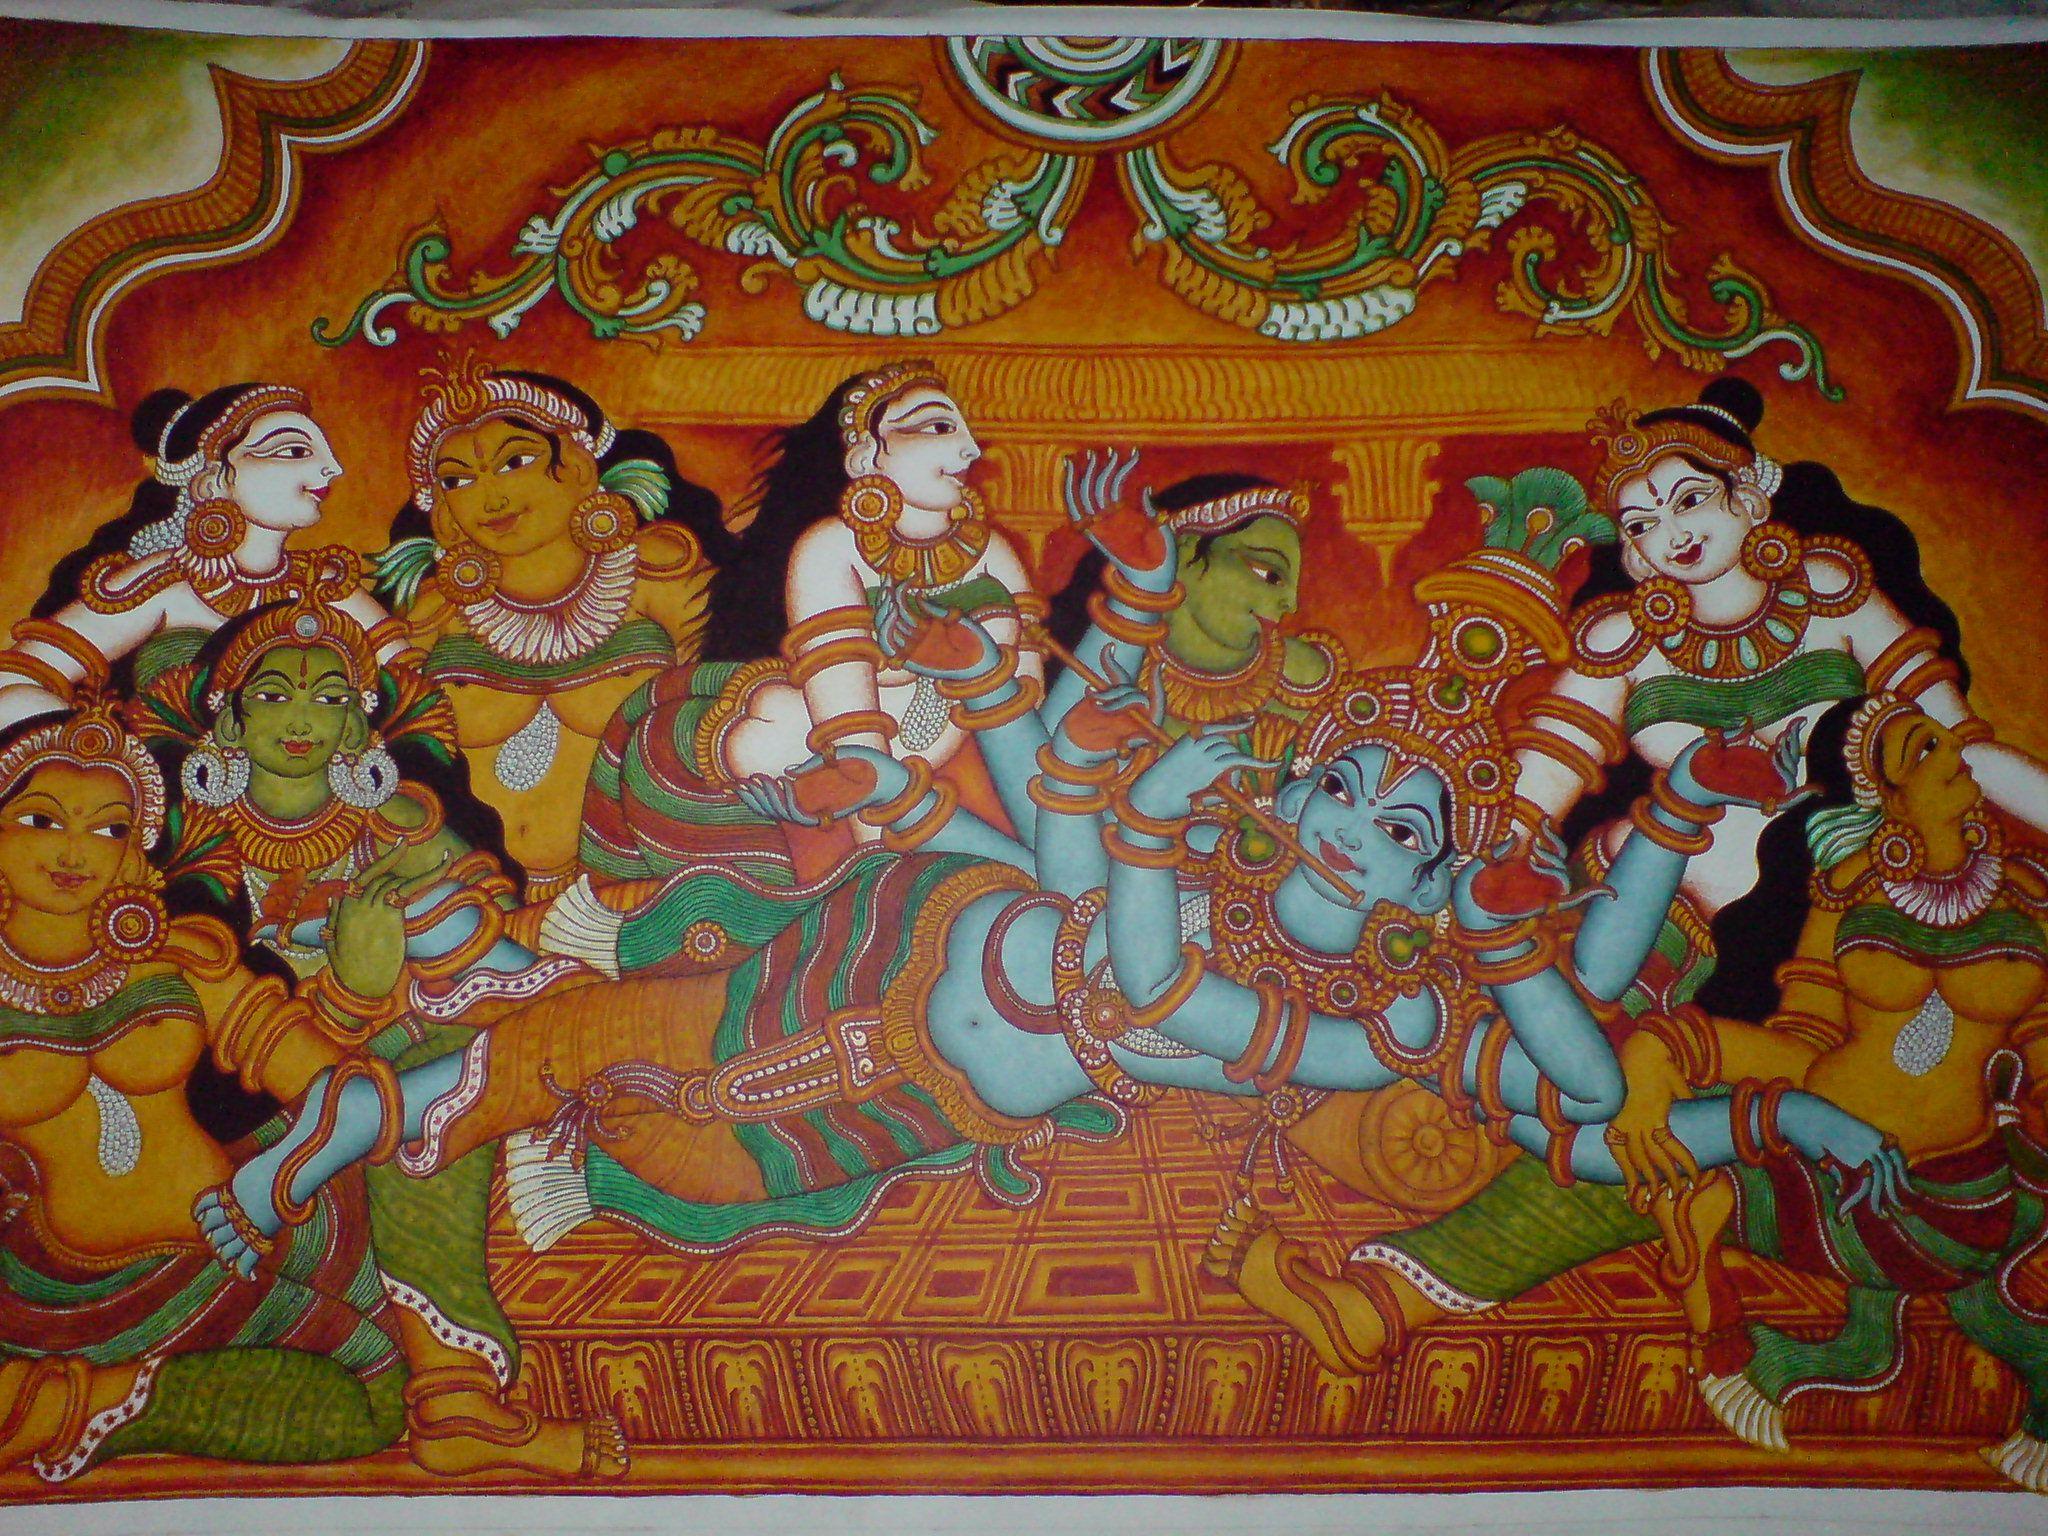 Revisiting traditional mural art t l namaste for Asha mural painting guruvayur